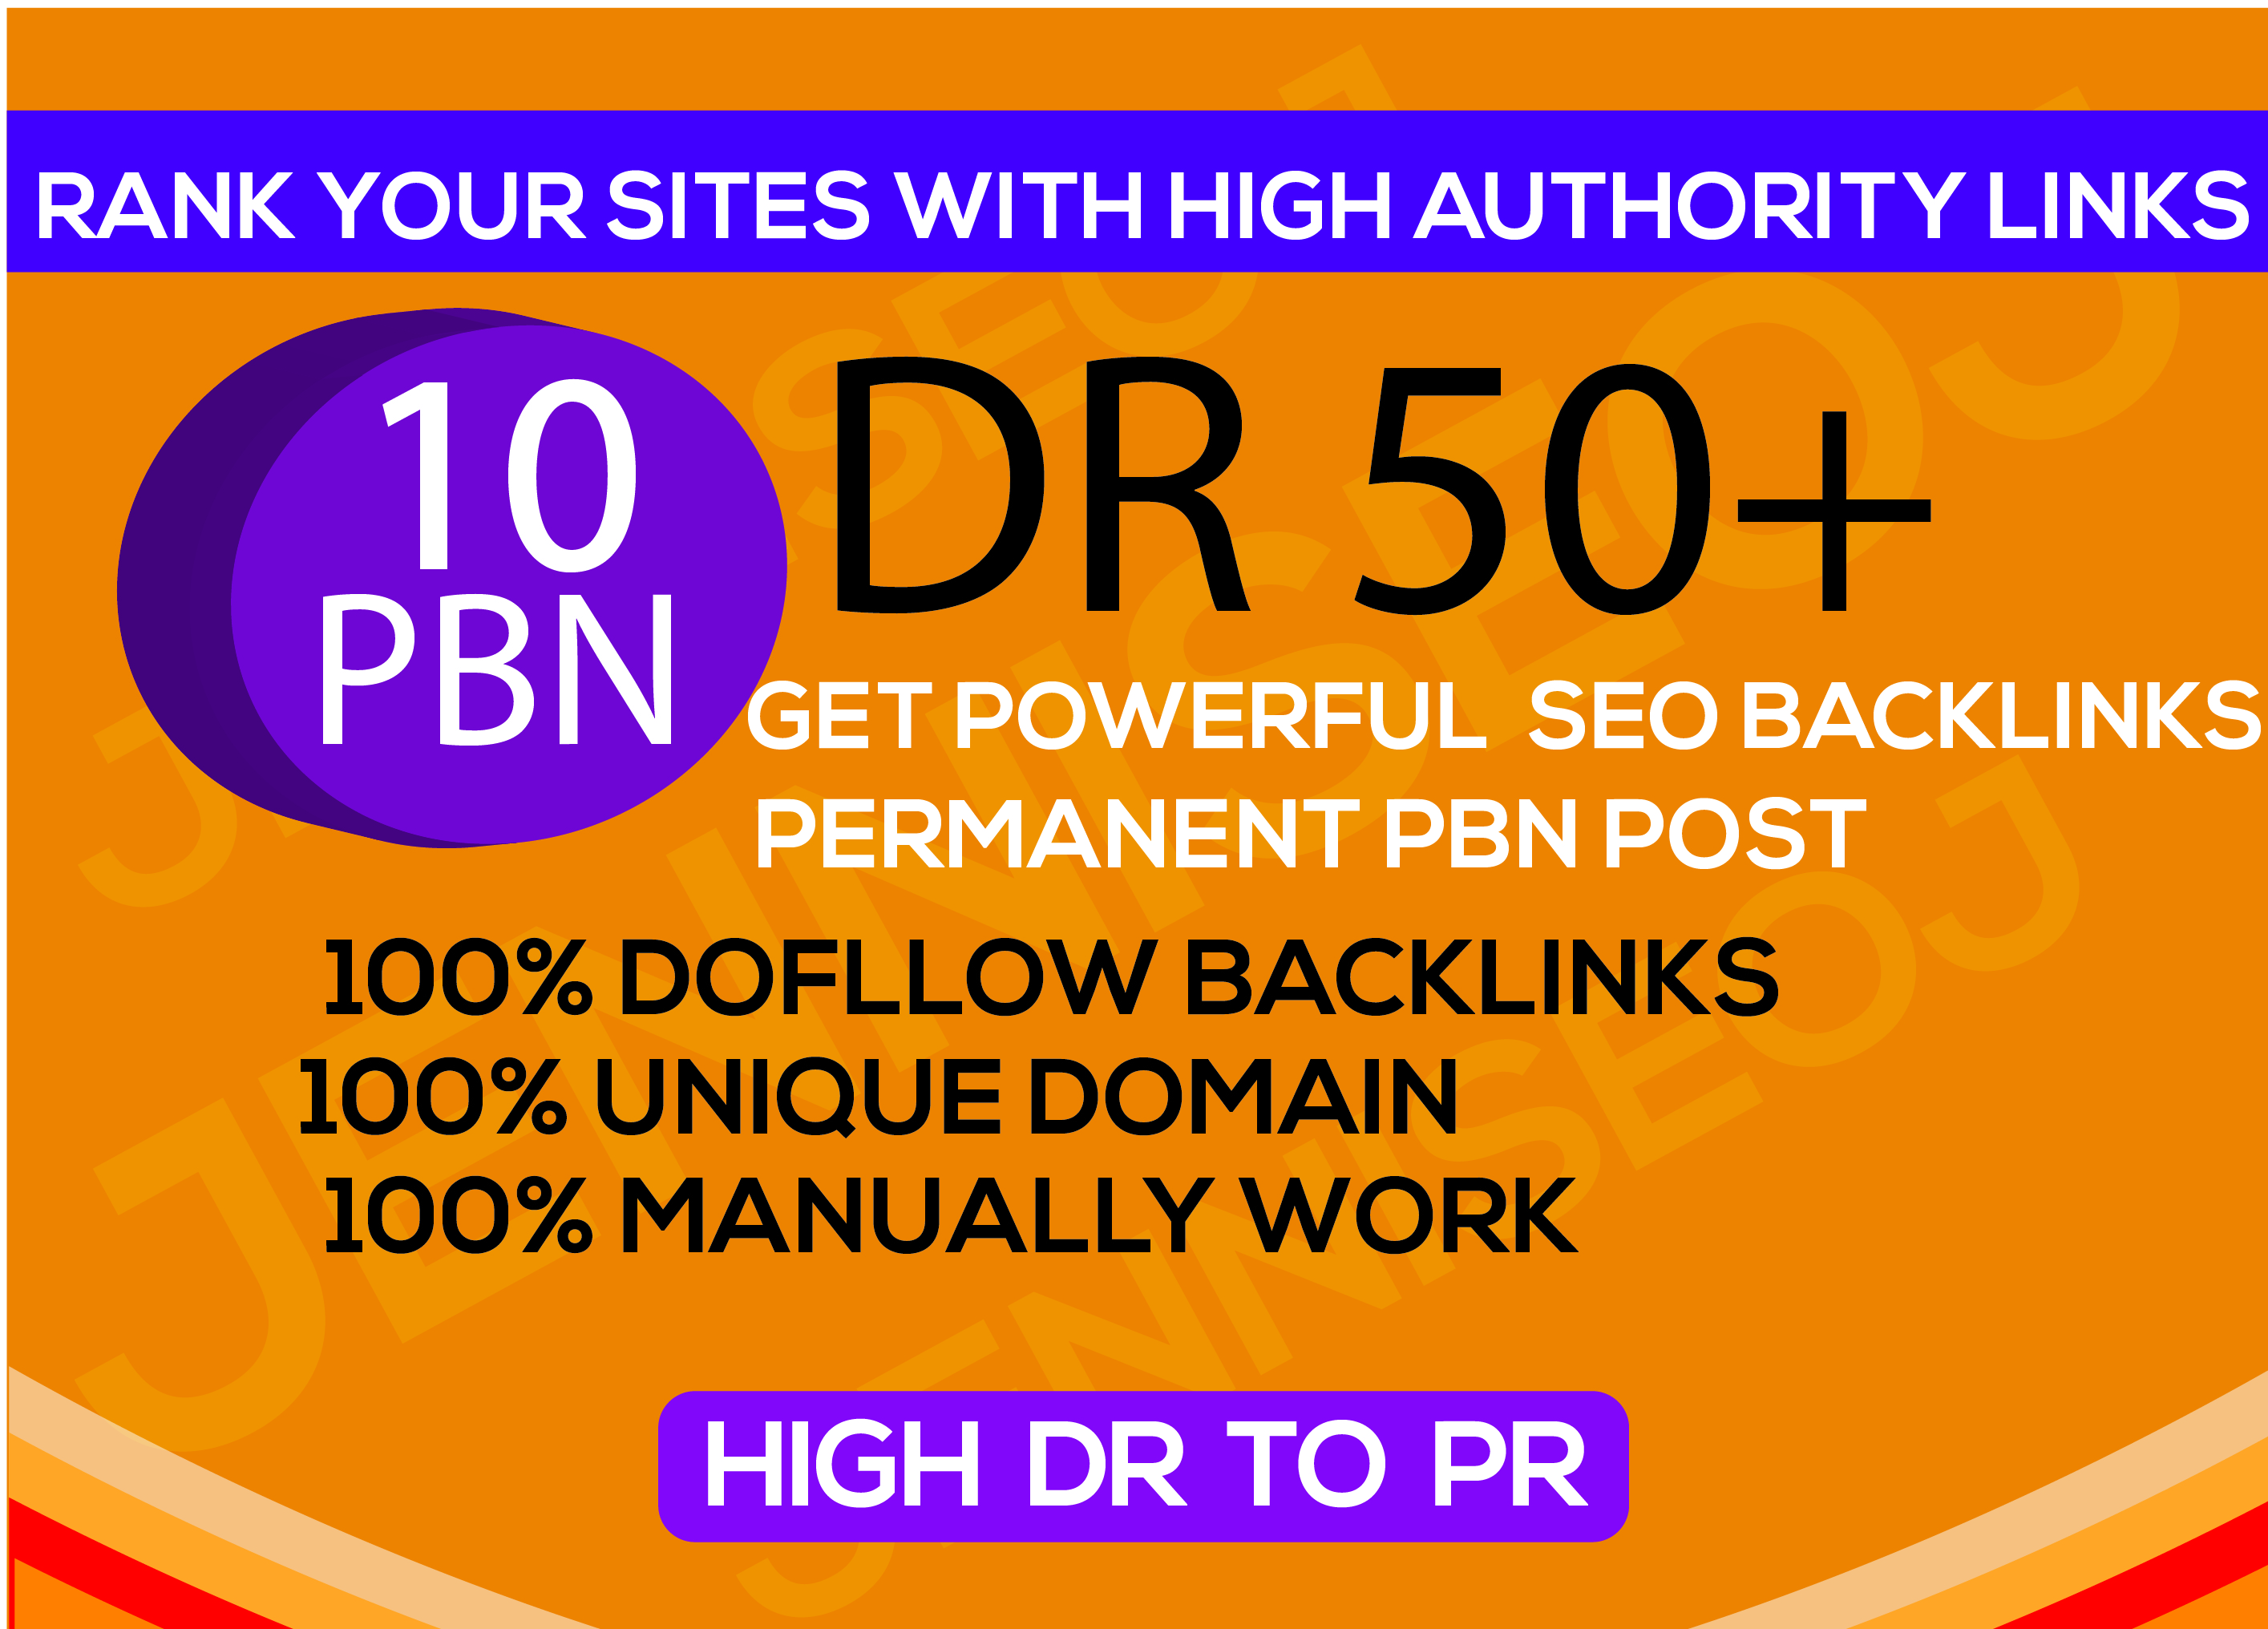 Create Unique Domain 10PBN DR50+ Homepage backlinks Dofollow high websaits DR